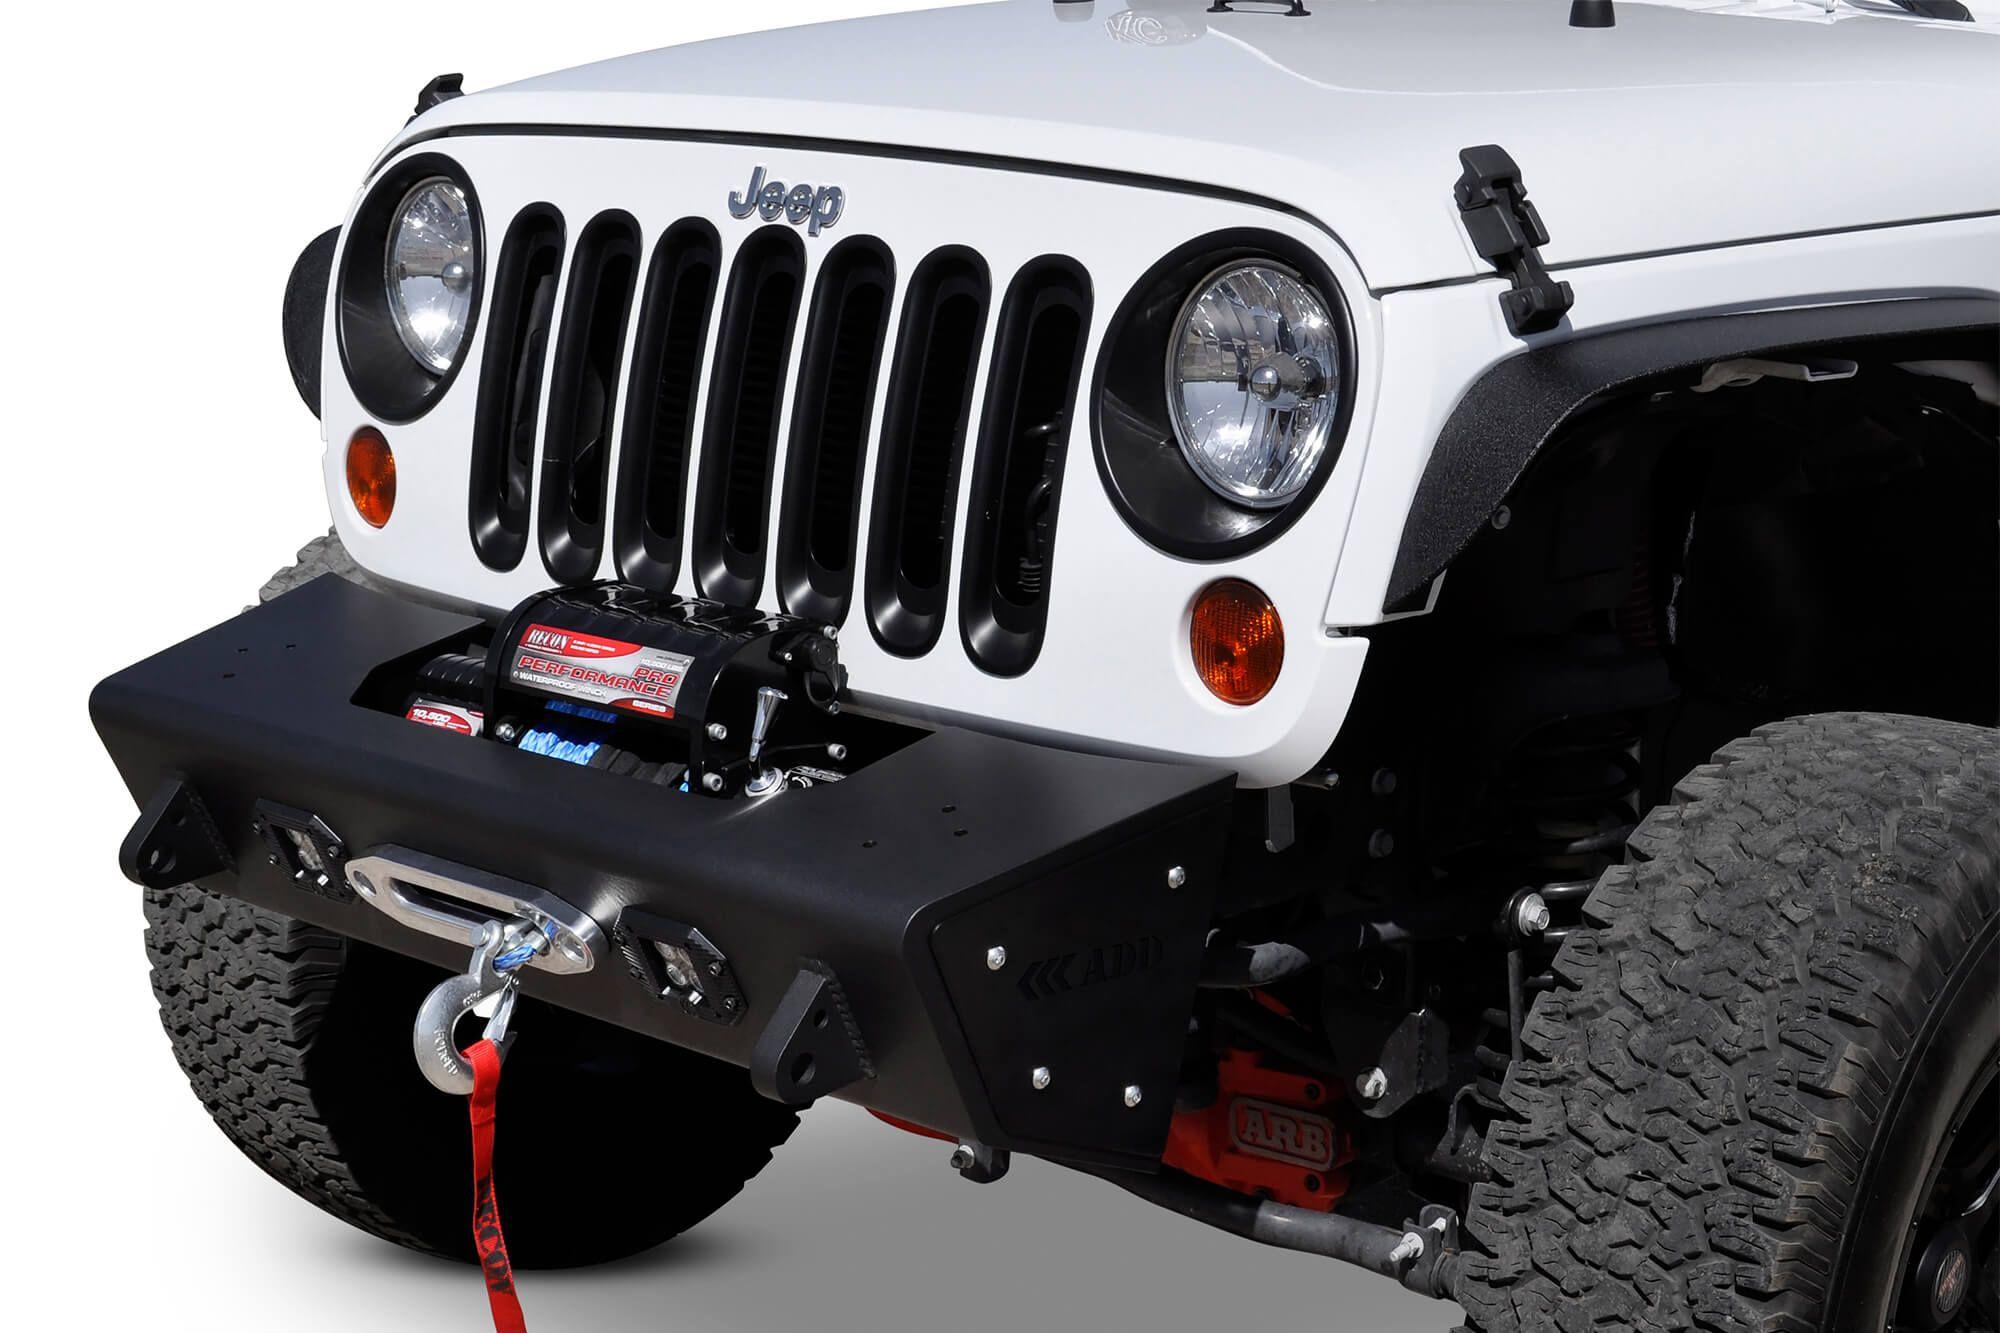 Jeep Jk Stealth Fighter Front Bumper Add Offroad Jeep Jk Jeep Wrangler Front Bumper Jeep